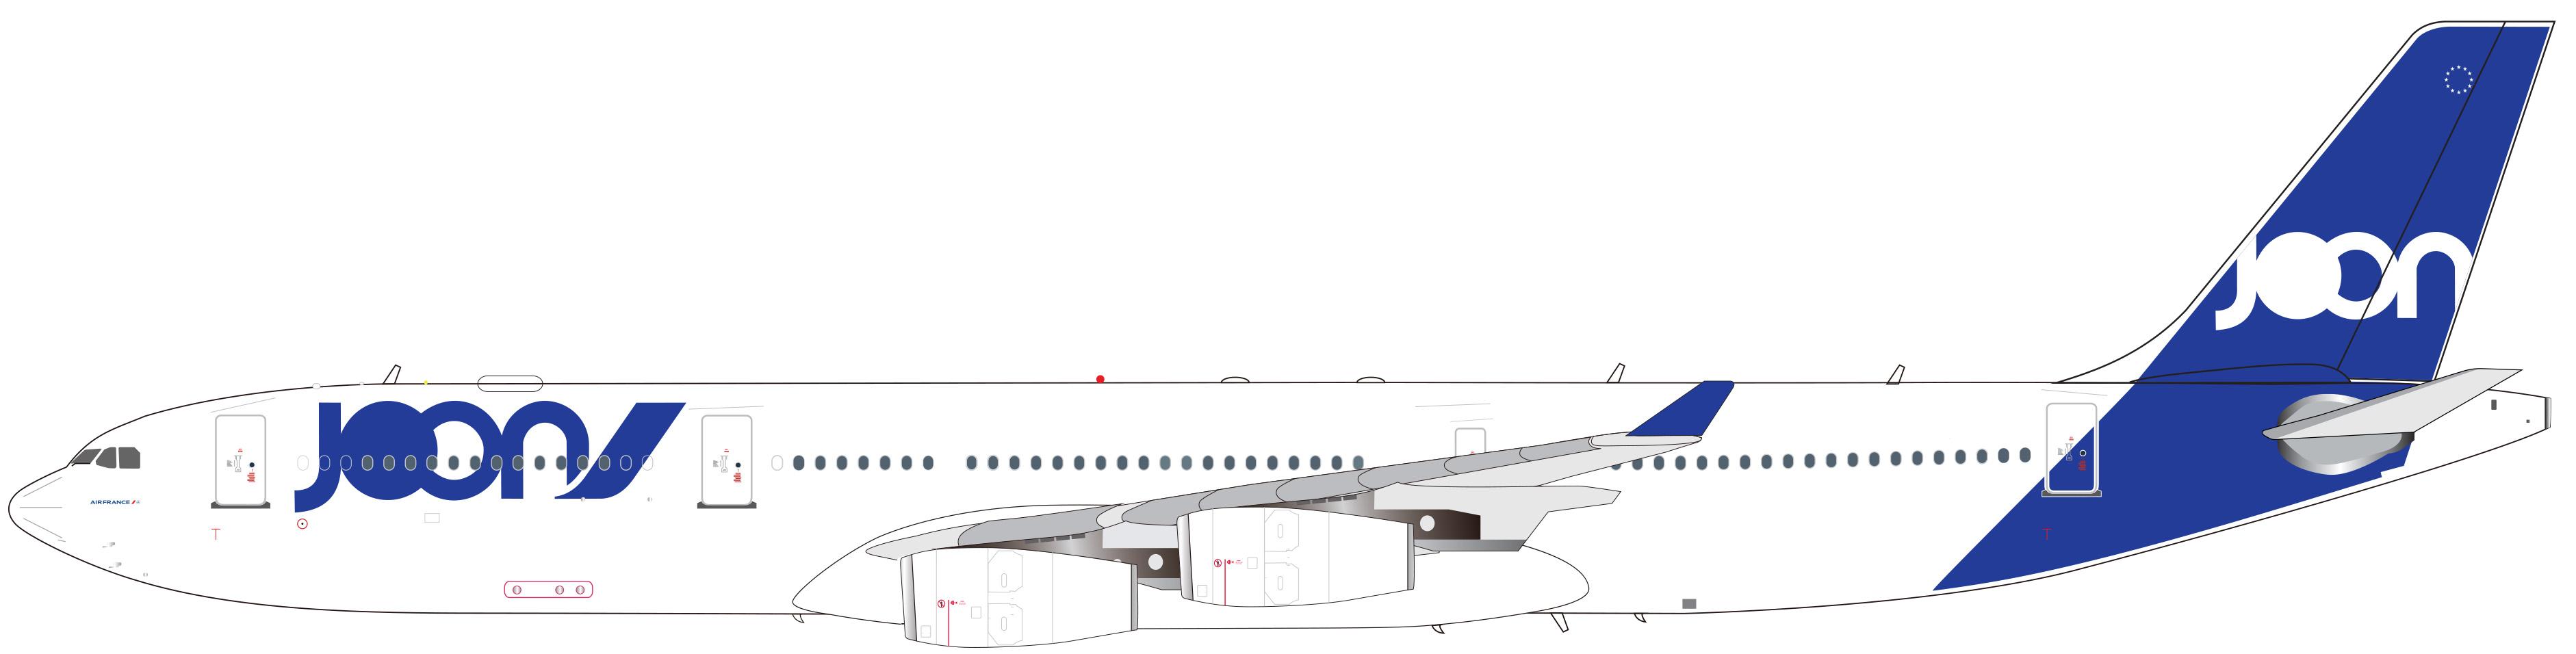 A340-300_JOON-4_SANS_IMMAT.png